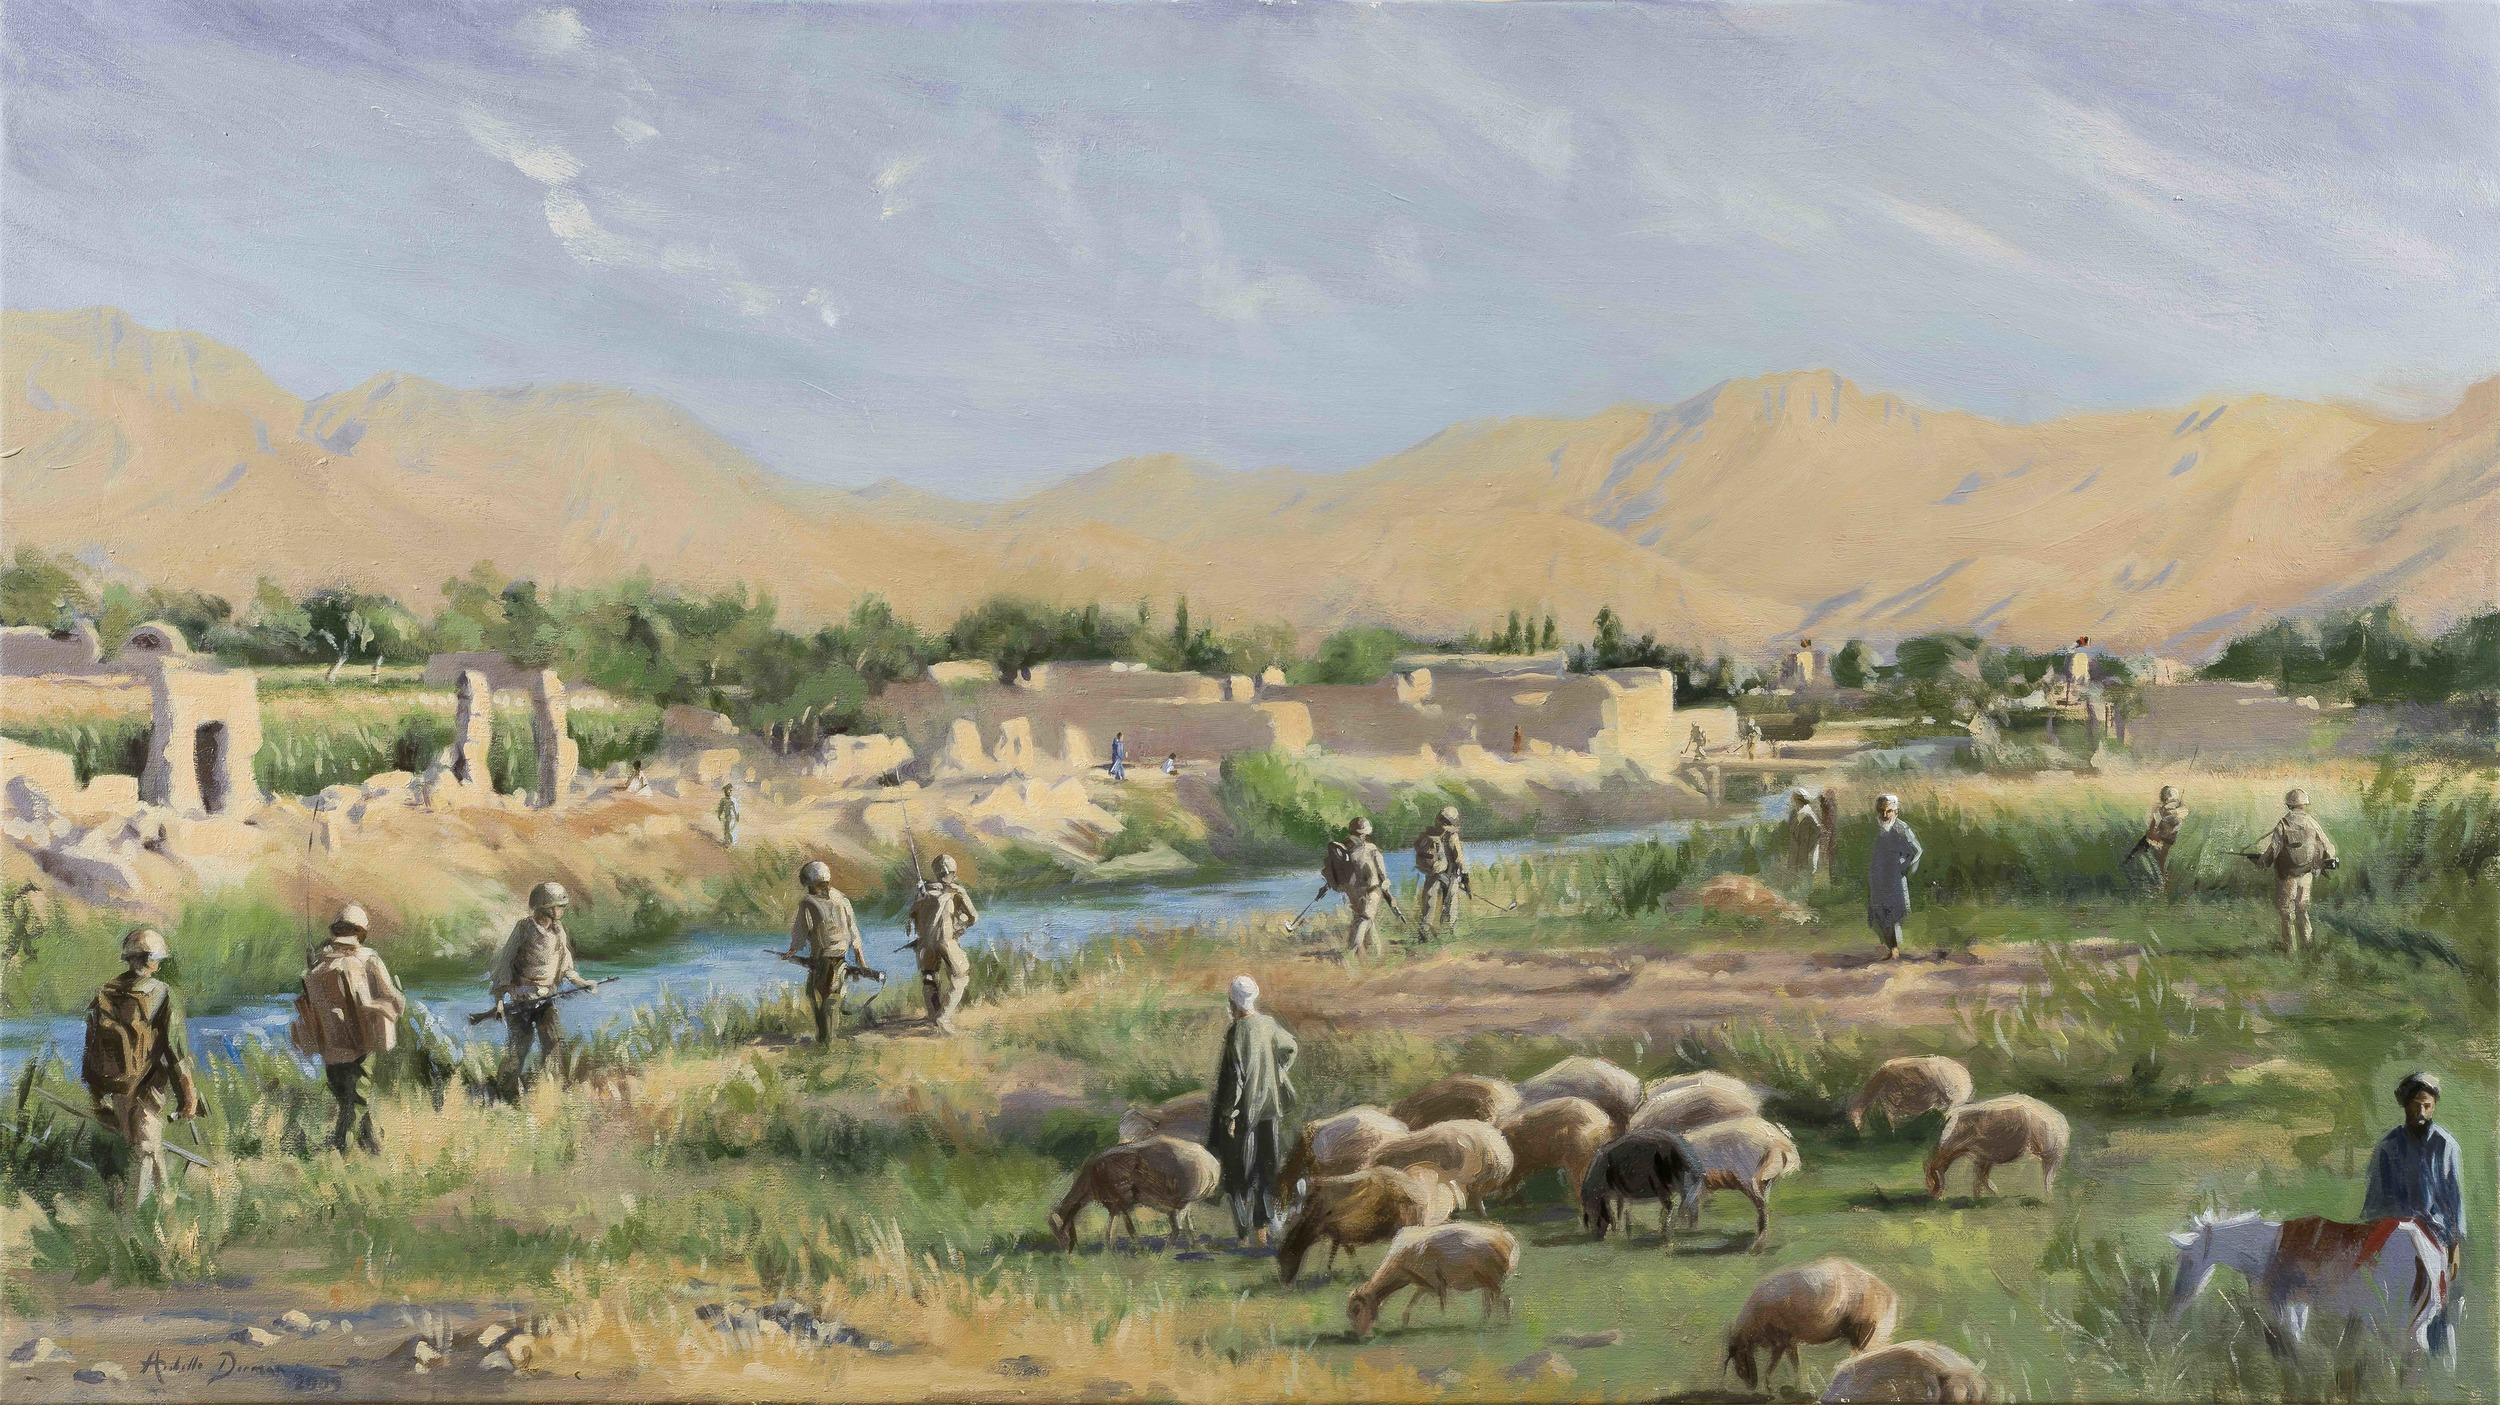 On Patrol, 2 Rifles, Sangin, Afghanistan